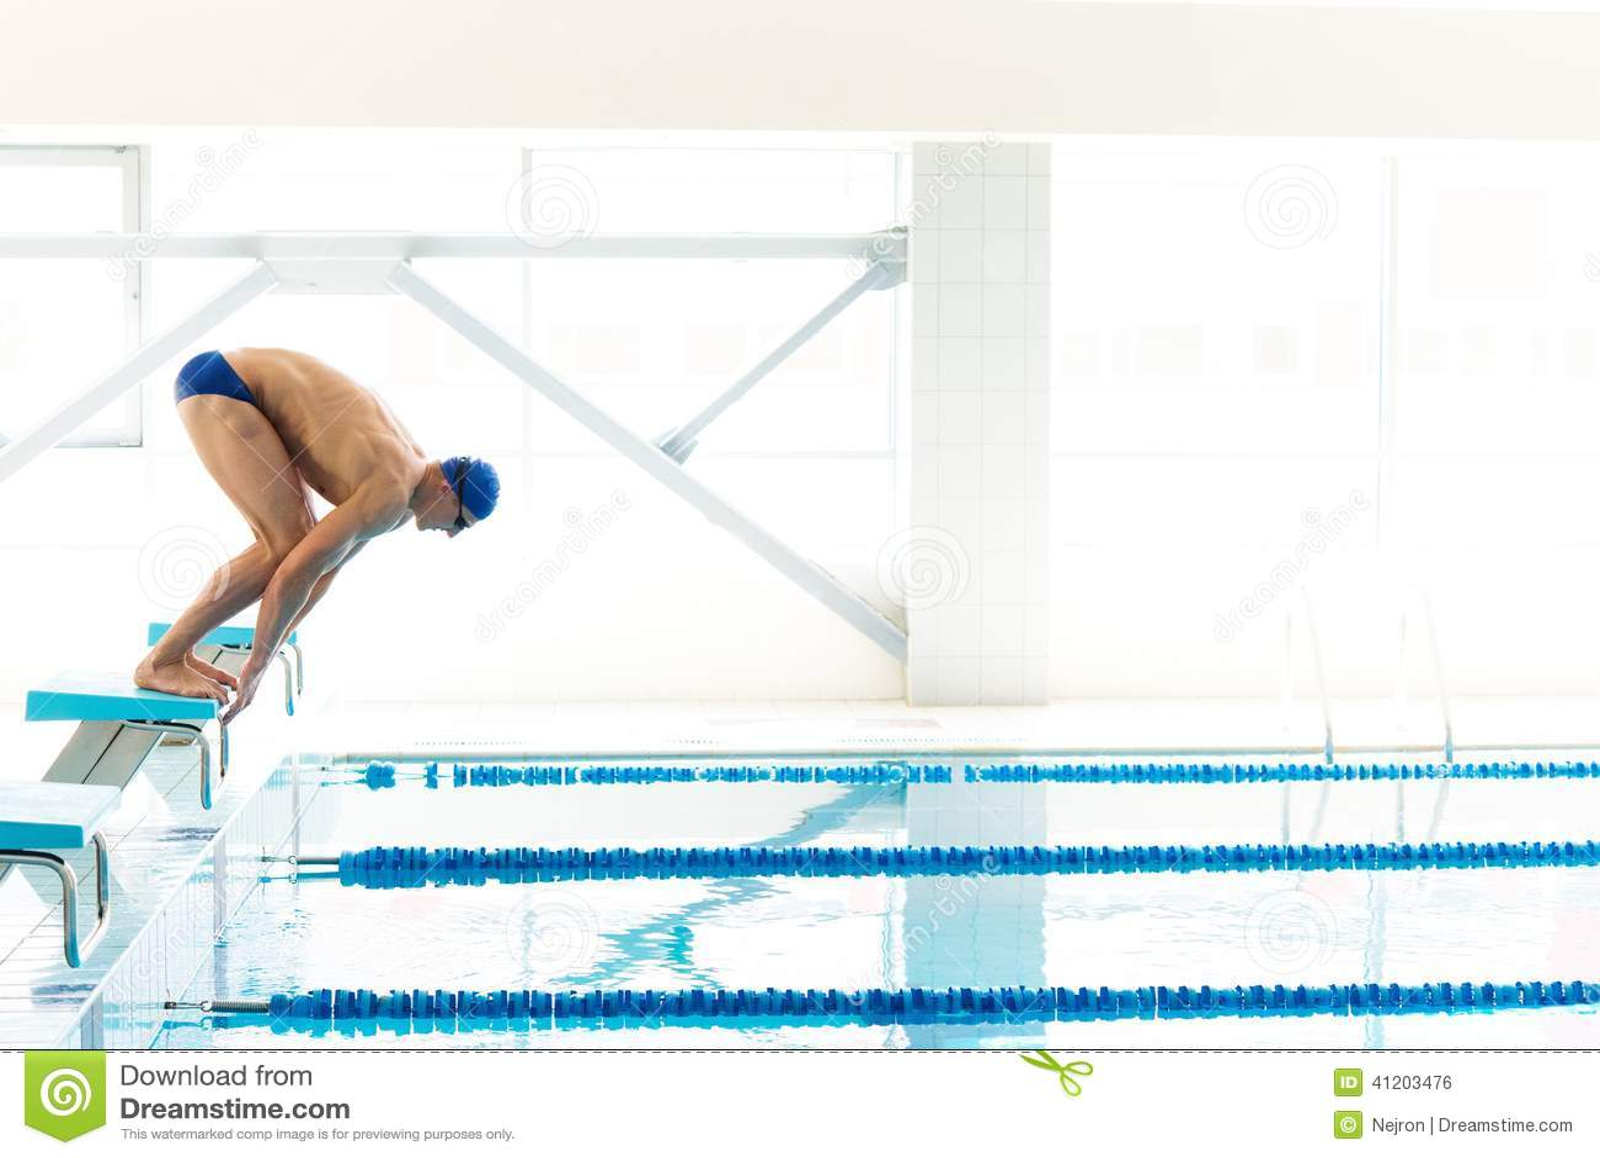 swimmer jumping from starting block i stock photo image of block lane 41203476